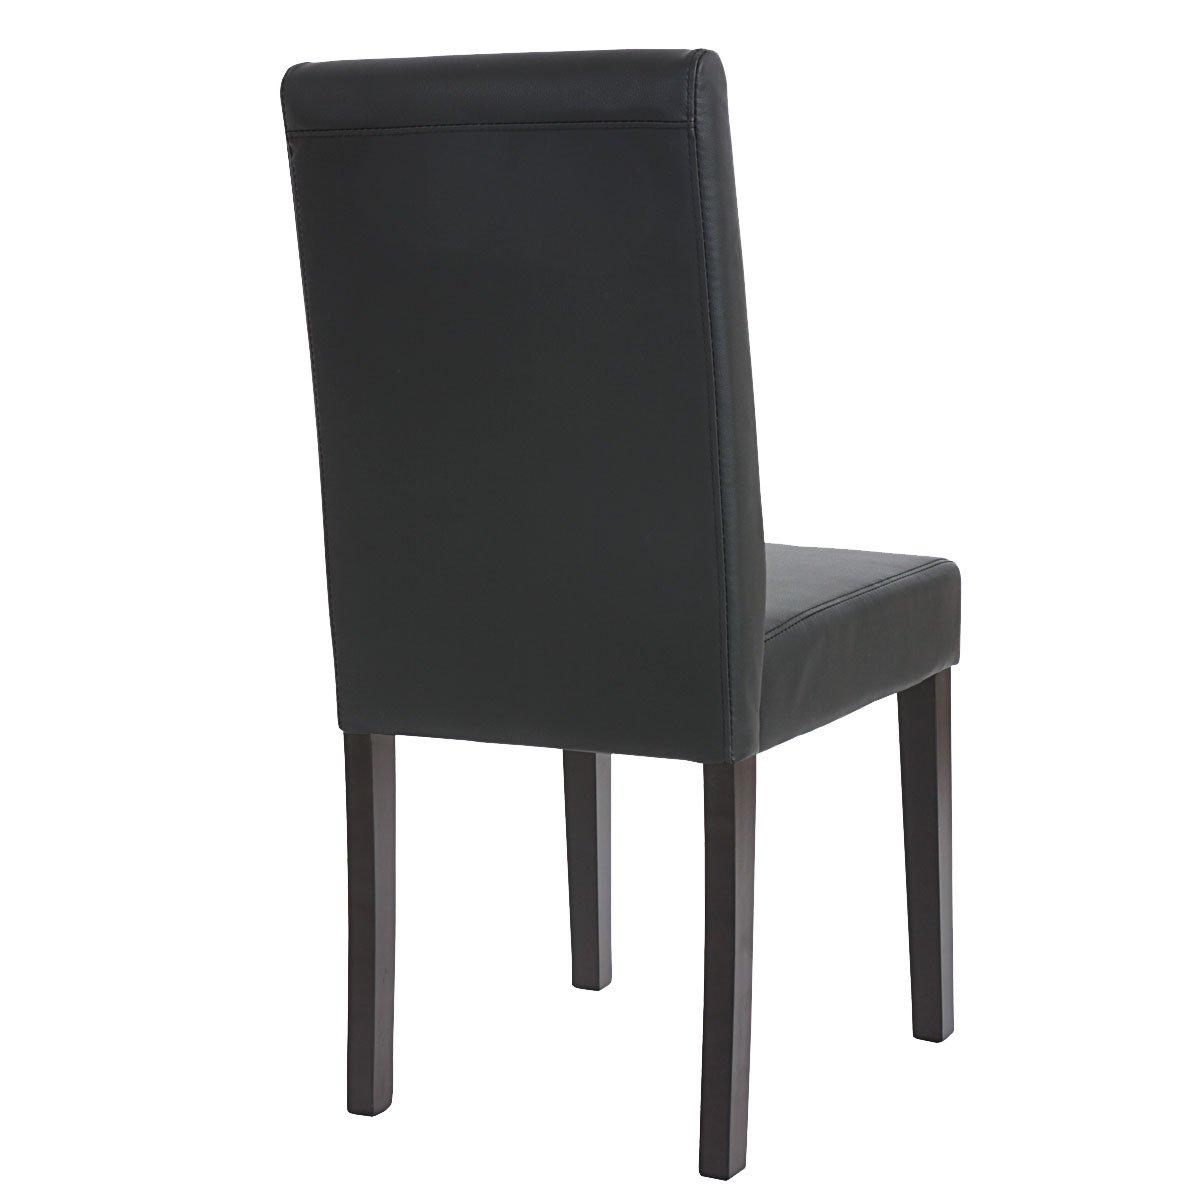 Lote 4 sillas de comedor litau piel mate negra lote 4 for Sillas de piel para comedor